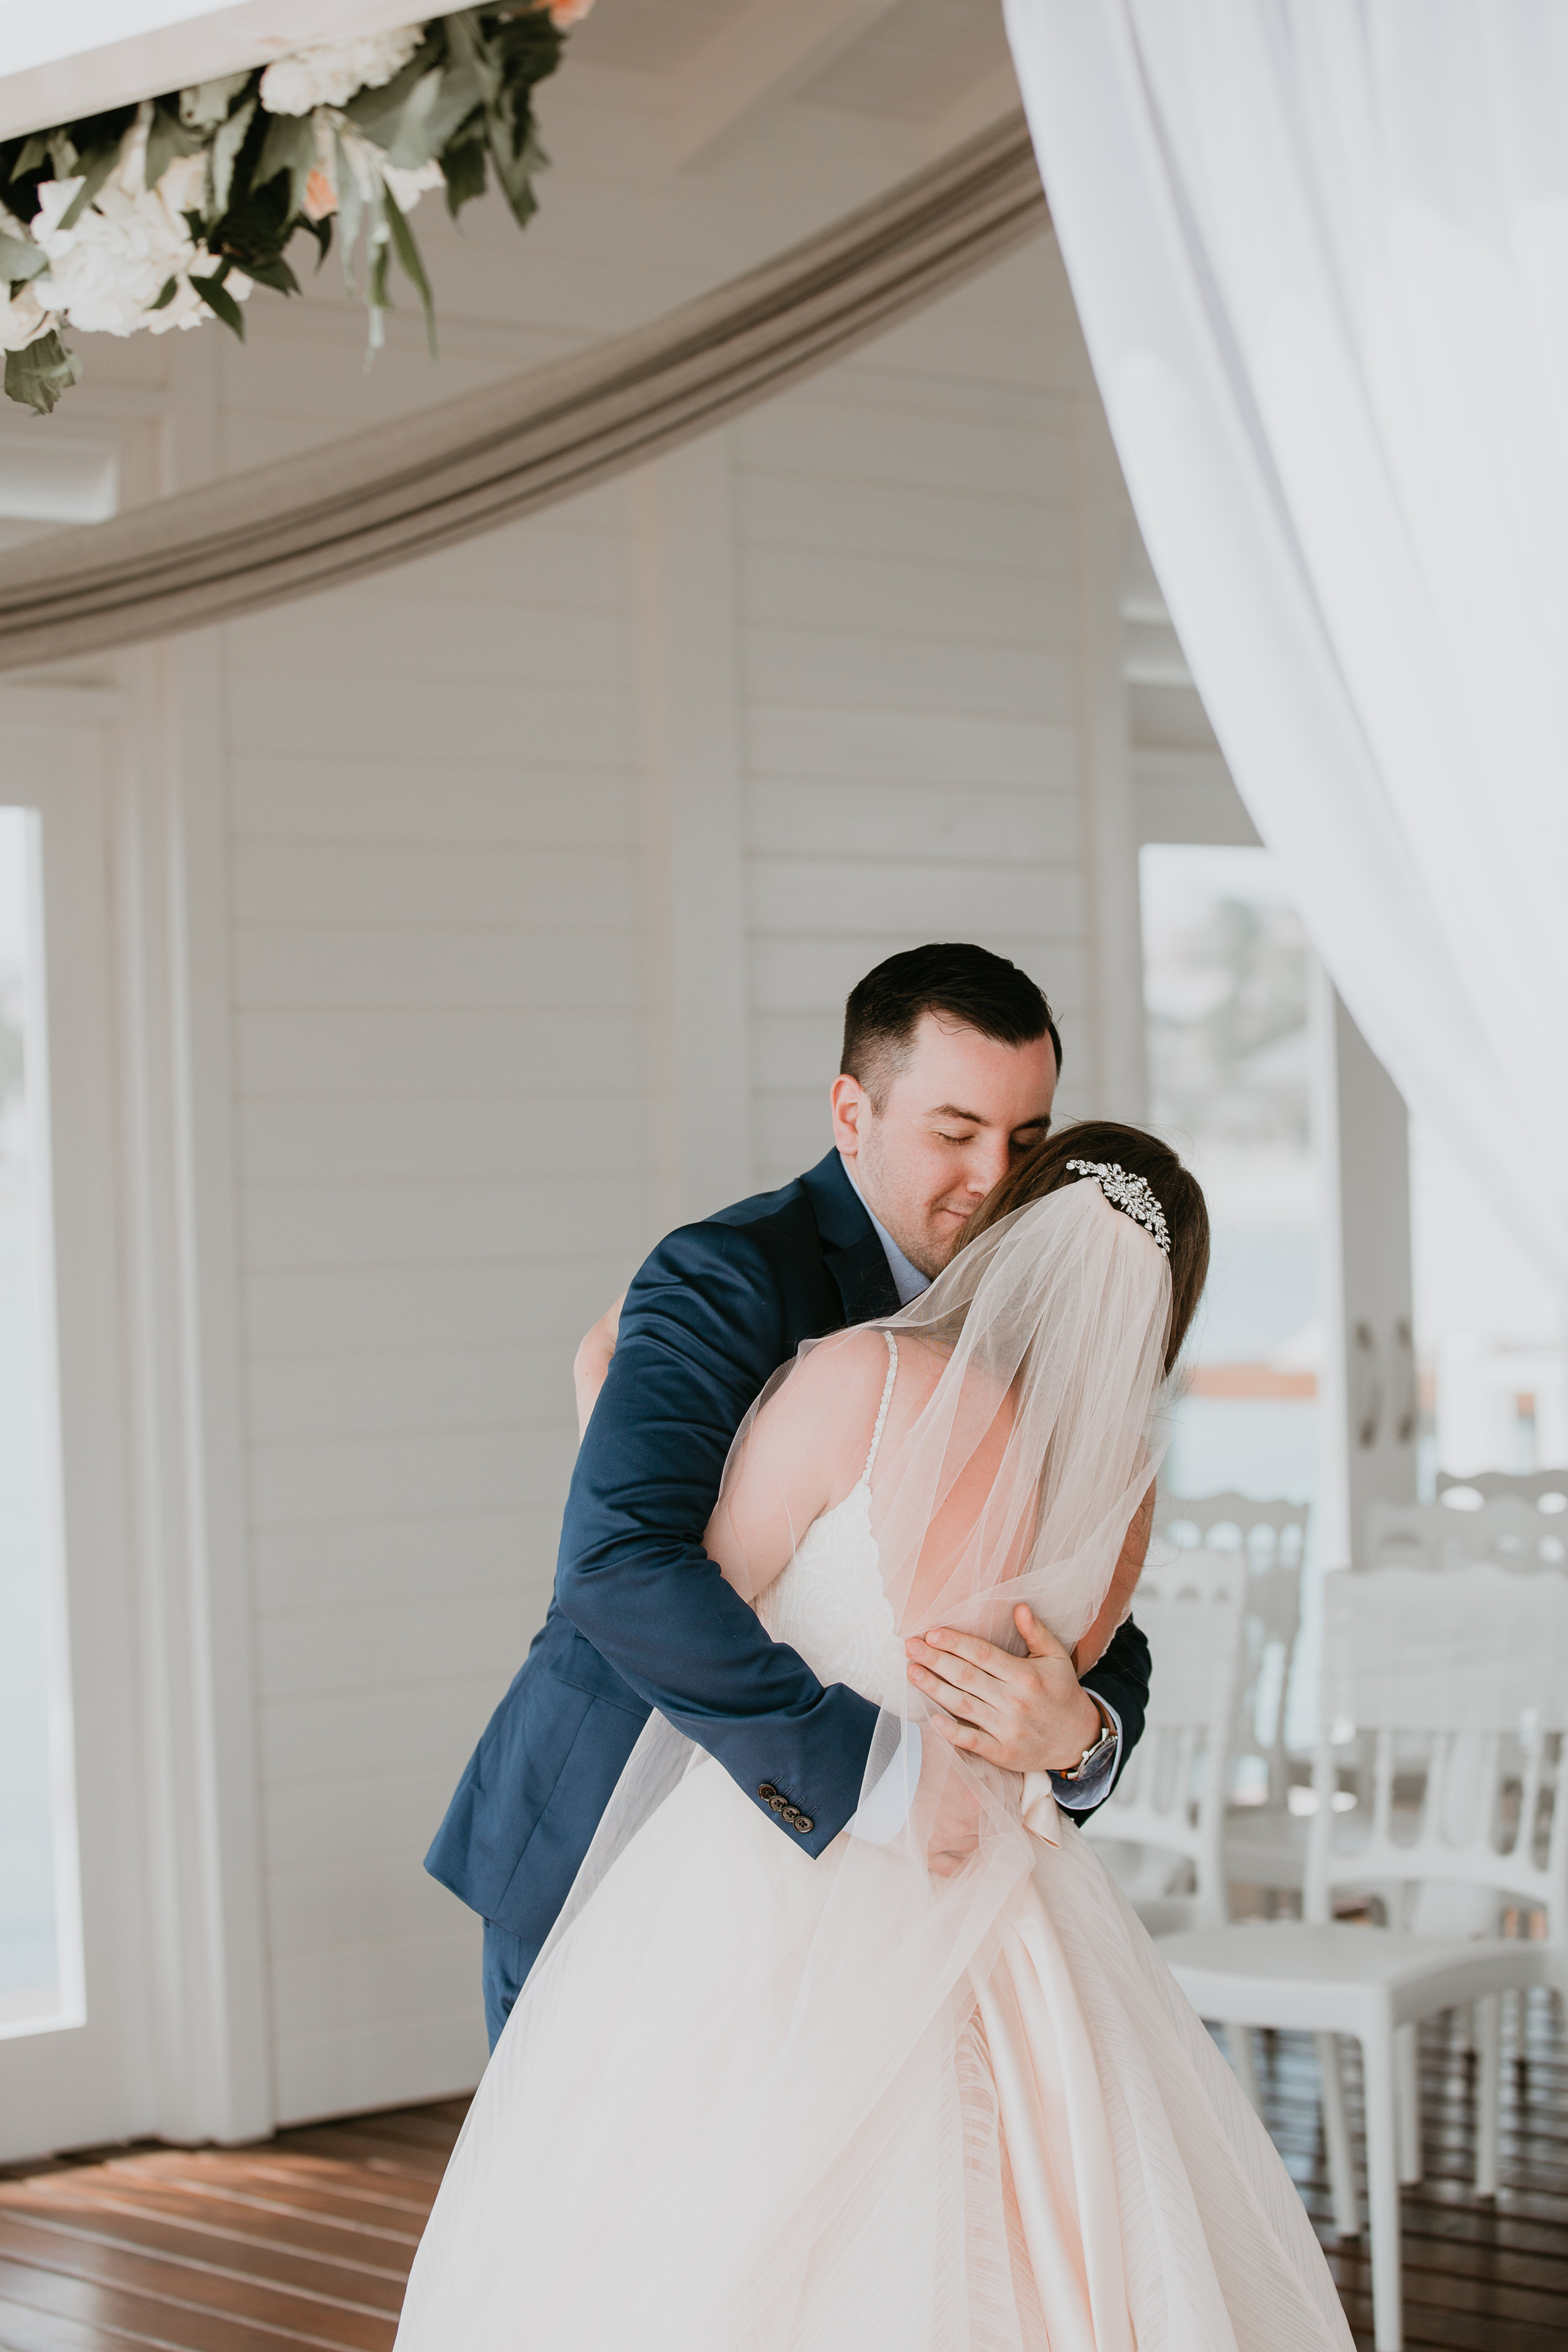 nicole-daacke-photography-destination-wedding-in-st-lucia-sandals-la-toc-intimate-island-wedding-carribean-elopement-photographer-chill-island-wedding-38.jpg